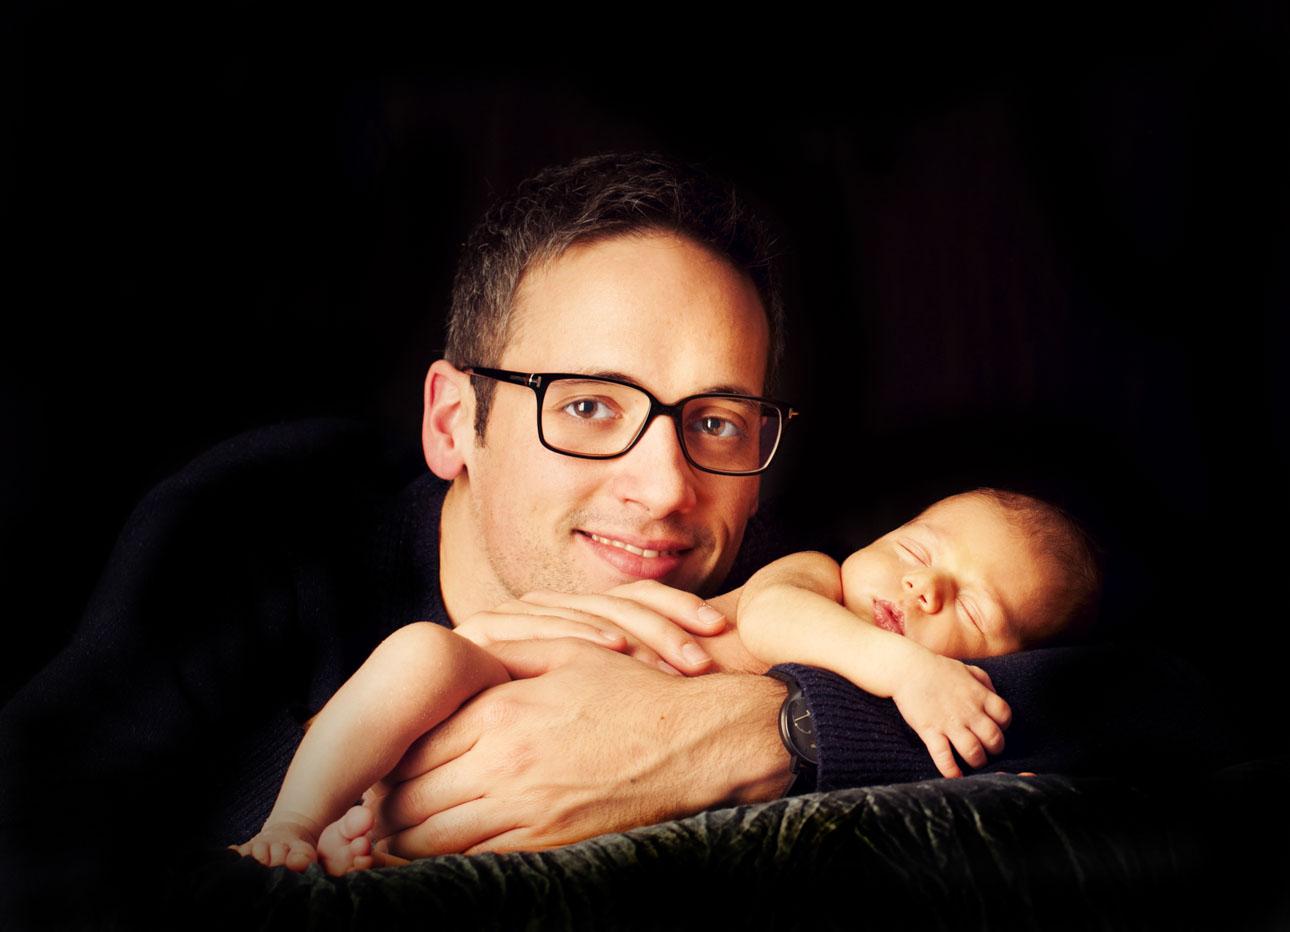 fotografias de bebes recien nacidos, sesion de fotos para bebes, fotos a bebes recien nacidos, fotografia de bebes recien nacidos, fotografa bebes, fotografiasrecien nacidos, fotos niños recien nacidos, sesion fotos bebes, fotos de estudio de bebes recien nacidos, fotos bebes recien nacidos estudio, fotos bebés recién nacidos, fotos originales de bebes recien nacidos, sesion fotos bebe barcelona, fotografo niños barcelona, sesionfotografica bebes, reportajes de bebes recien nacidos, fotos bebe madrid, fotos de bebe recien nacido, fotografos niños, fotografiarecien nacidos barcelona, atrezzo para bebes, sesiones fotos, fotografias de bebes originales, niños recien nacidos fotos, caritas de bebes, fotografia bebe barcelona, ver fotos de bebes recien nacidos